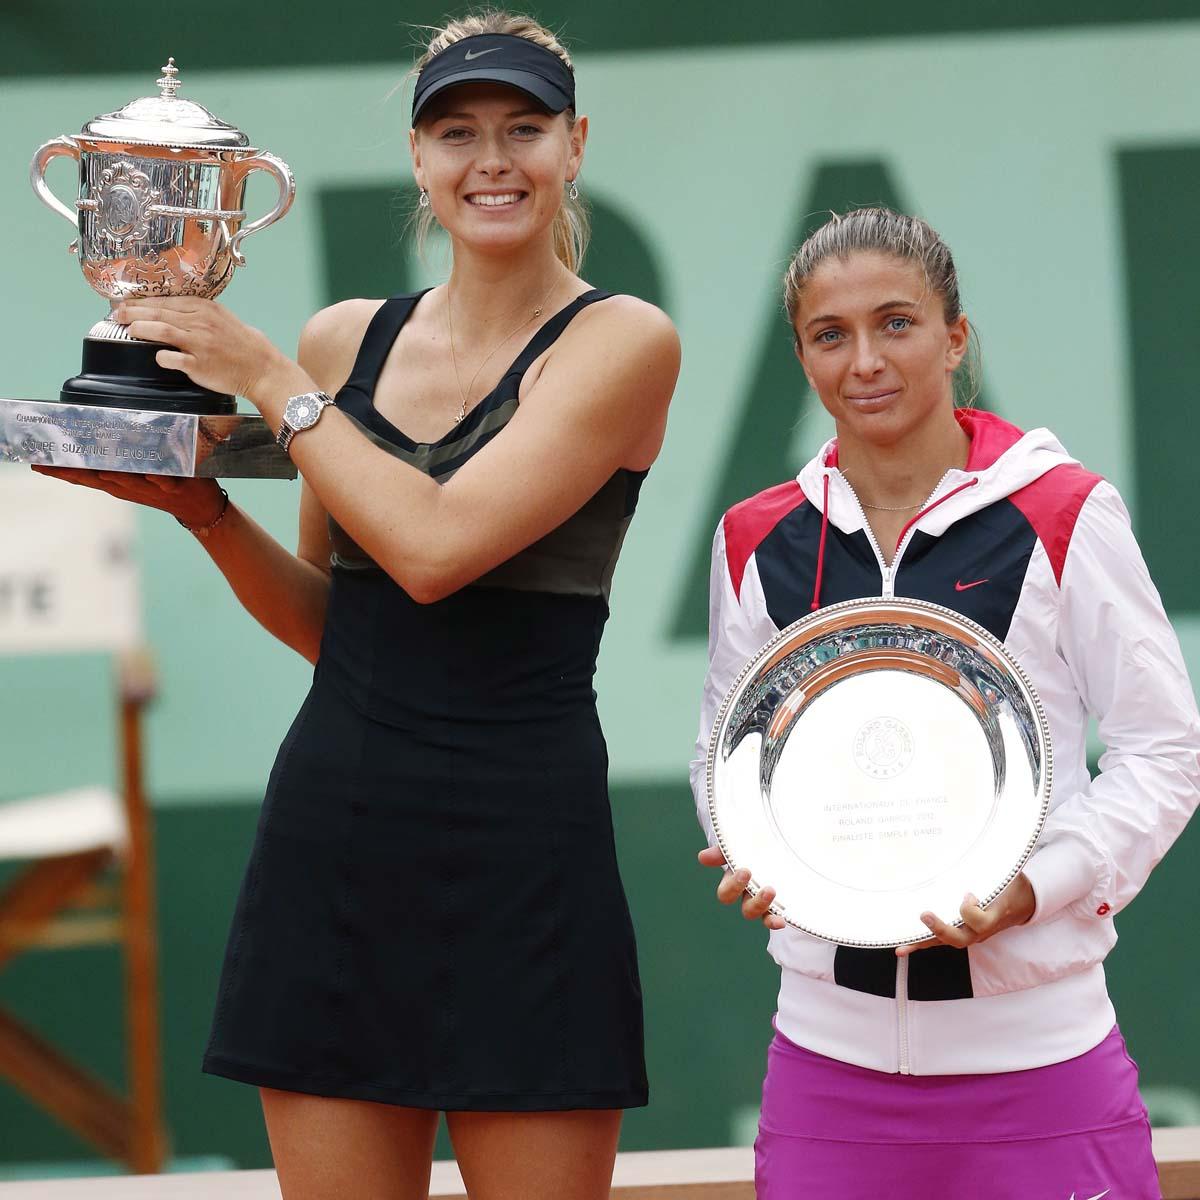 La Cote des Montres : Photo - TAG Heuer / Maria Sharapova n°1 mondial remporte Roland Garros